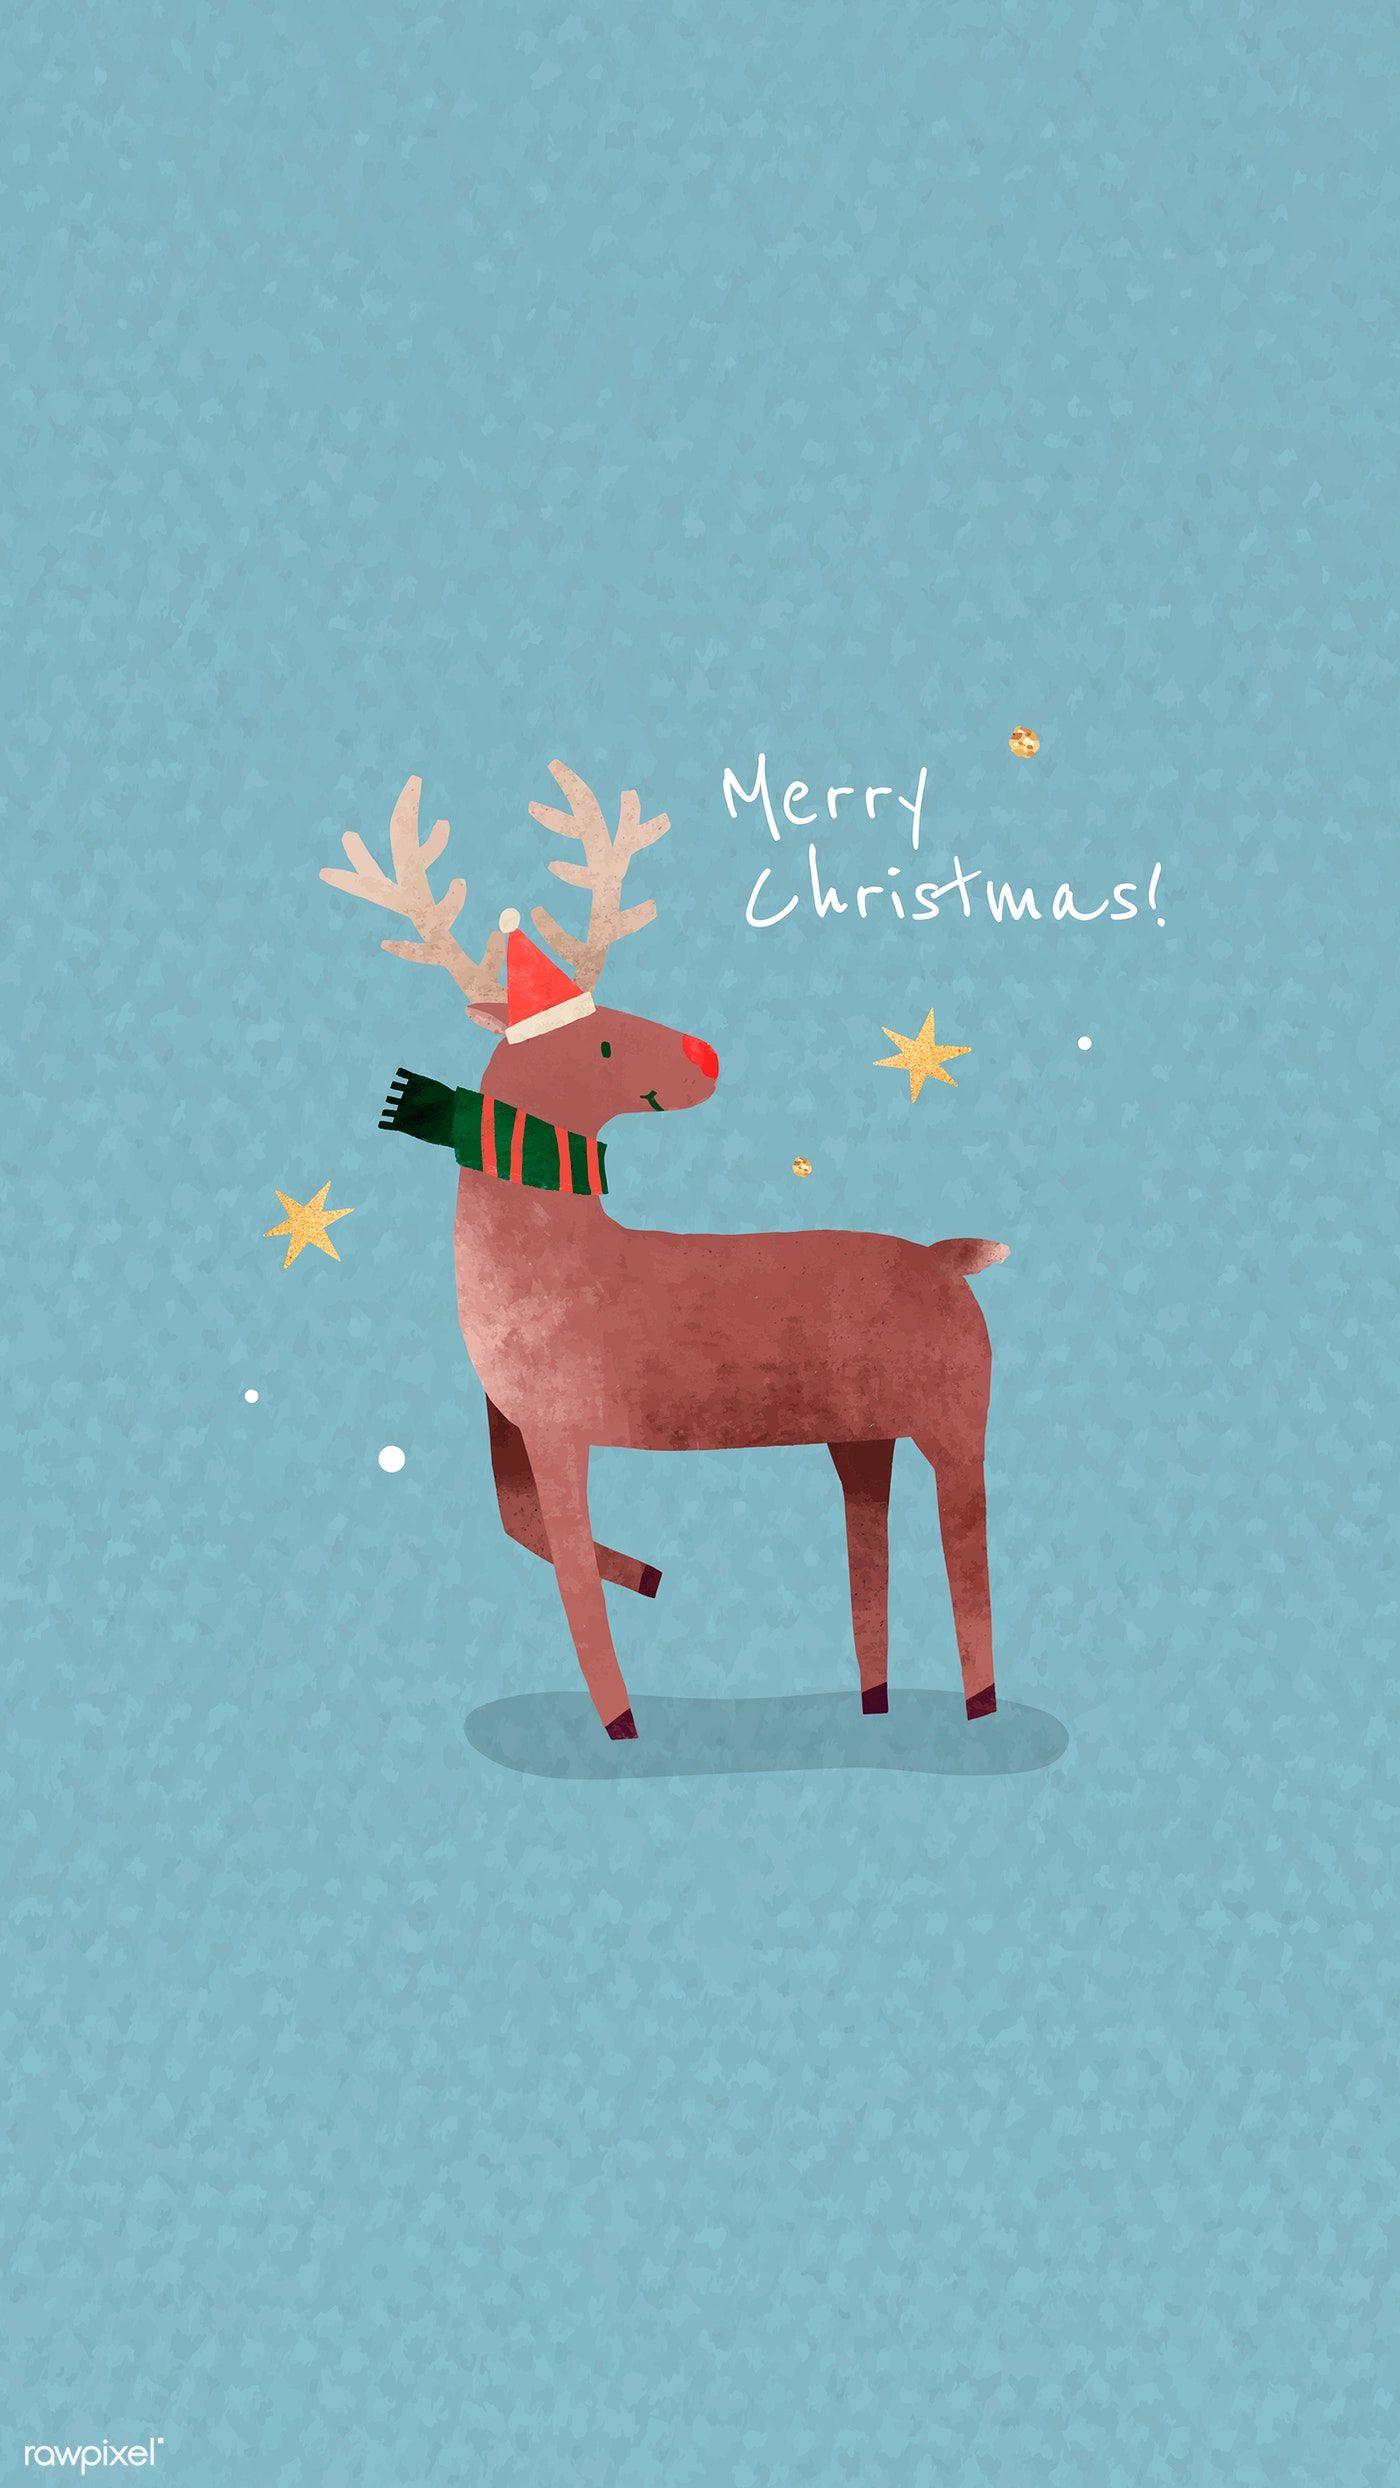 Download Premium Vector Of Reindeer With Santa Hat Mobile Phone Wallpaper Christmas Phone Backgrounds Wallpaper Iphone Christmas Cute Christmas Wallpaper